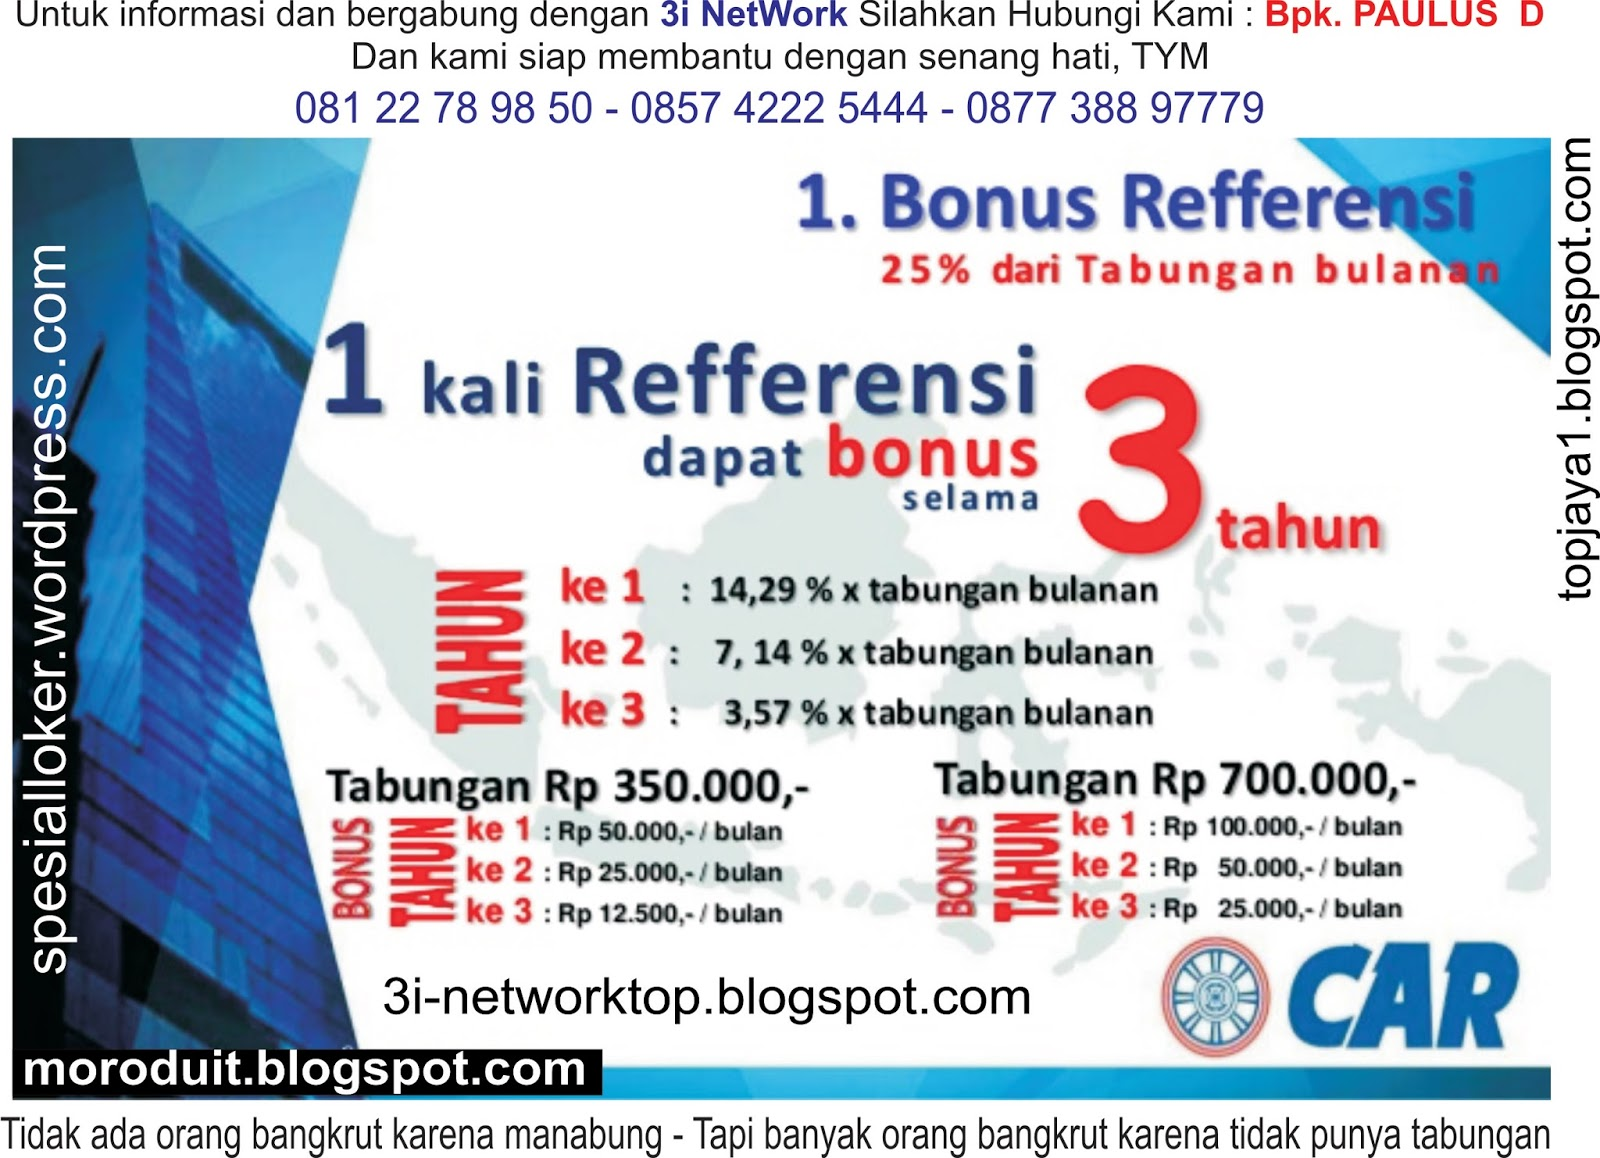 Grosir Baja Ringan Kebumen Peluang Sukses Utk : Guru, Dosen, Karyawan, Ojek, Sopir ...